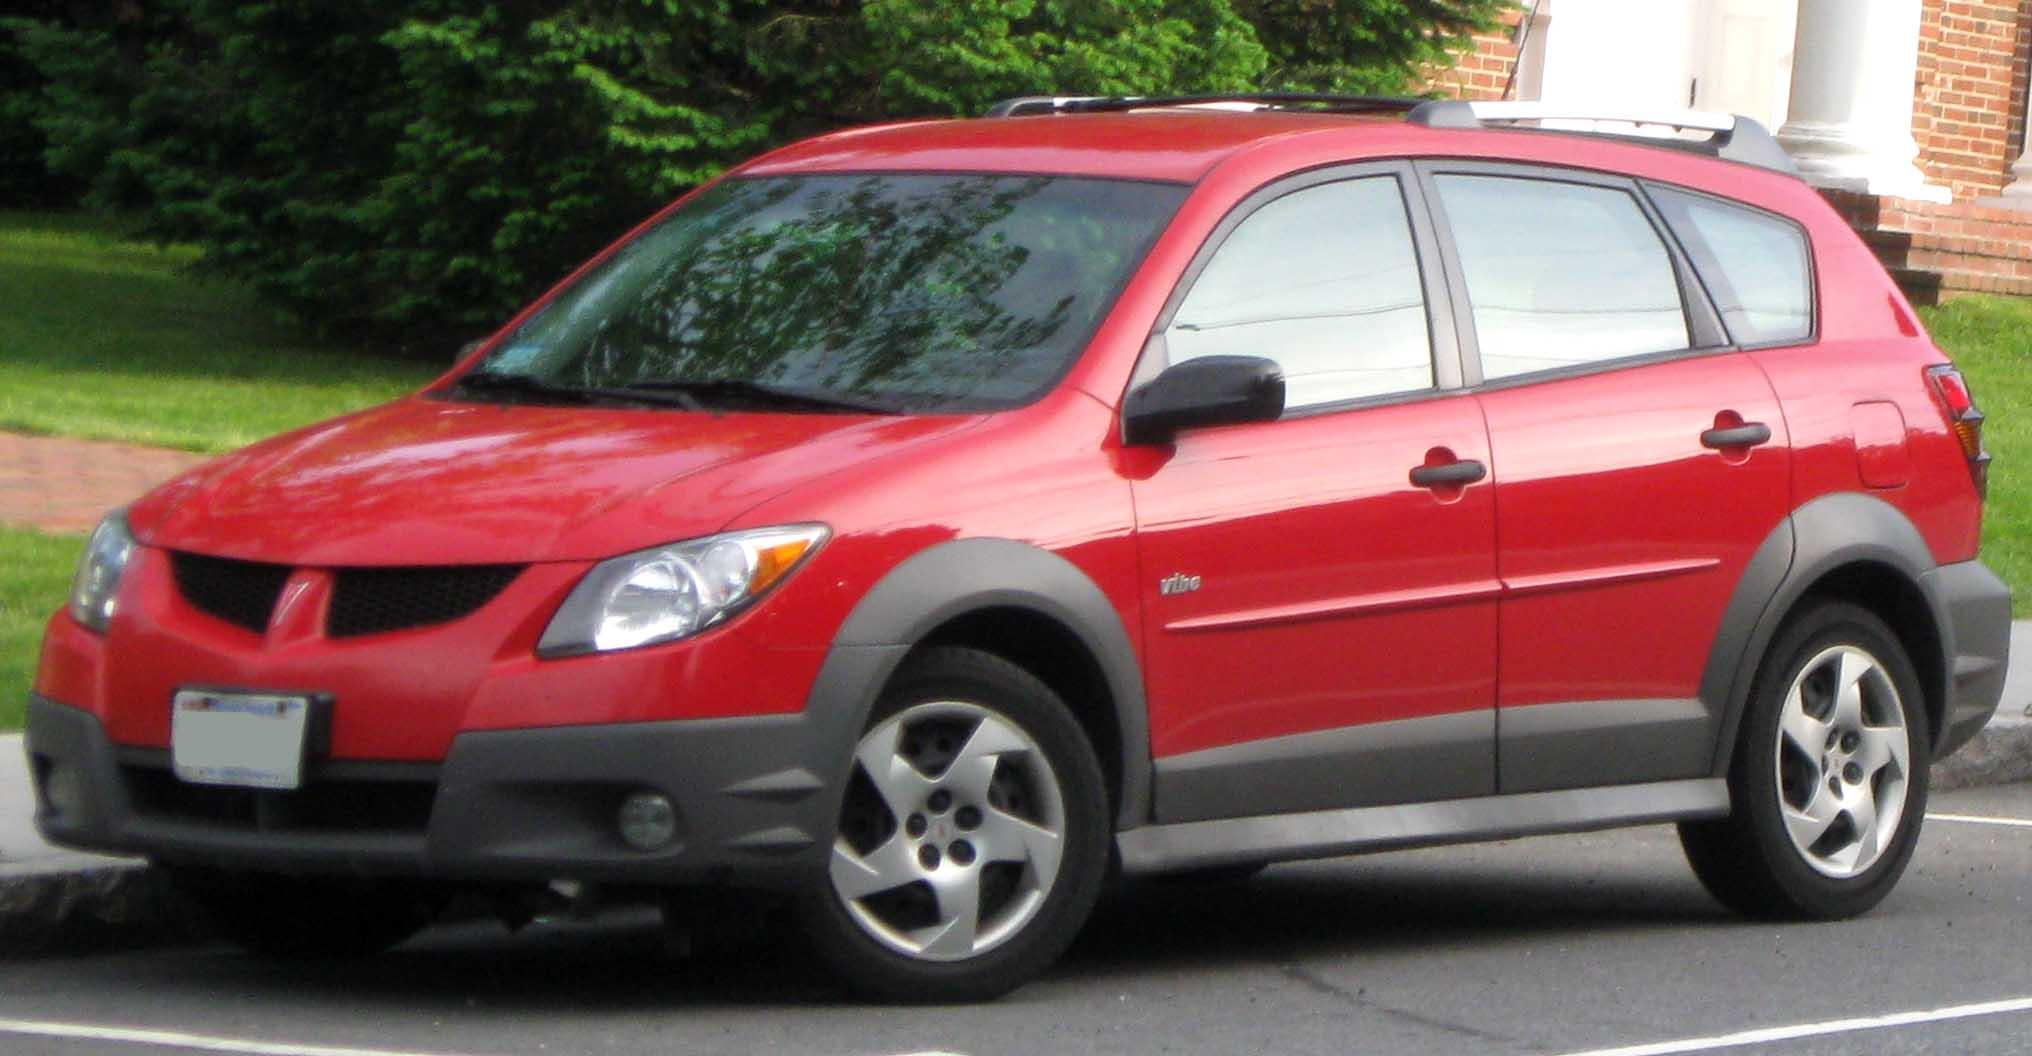 File:2003-2004 Pontiac Vibe -- 05-23-2010.jpg - Wikimedia ...